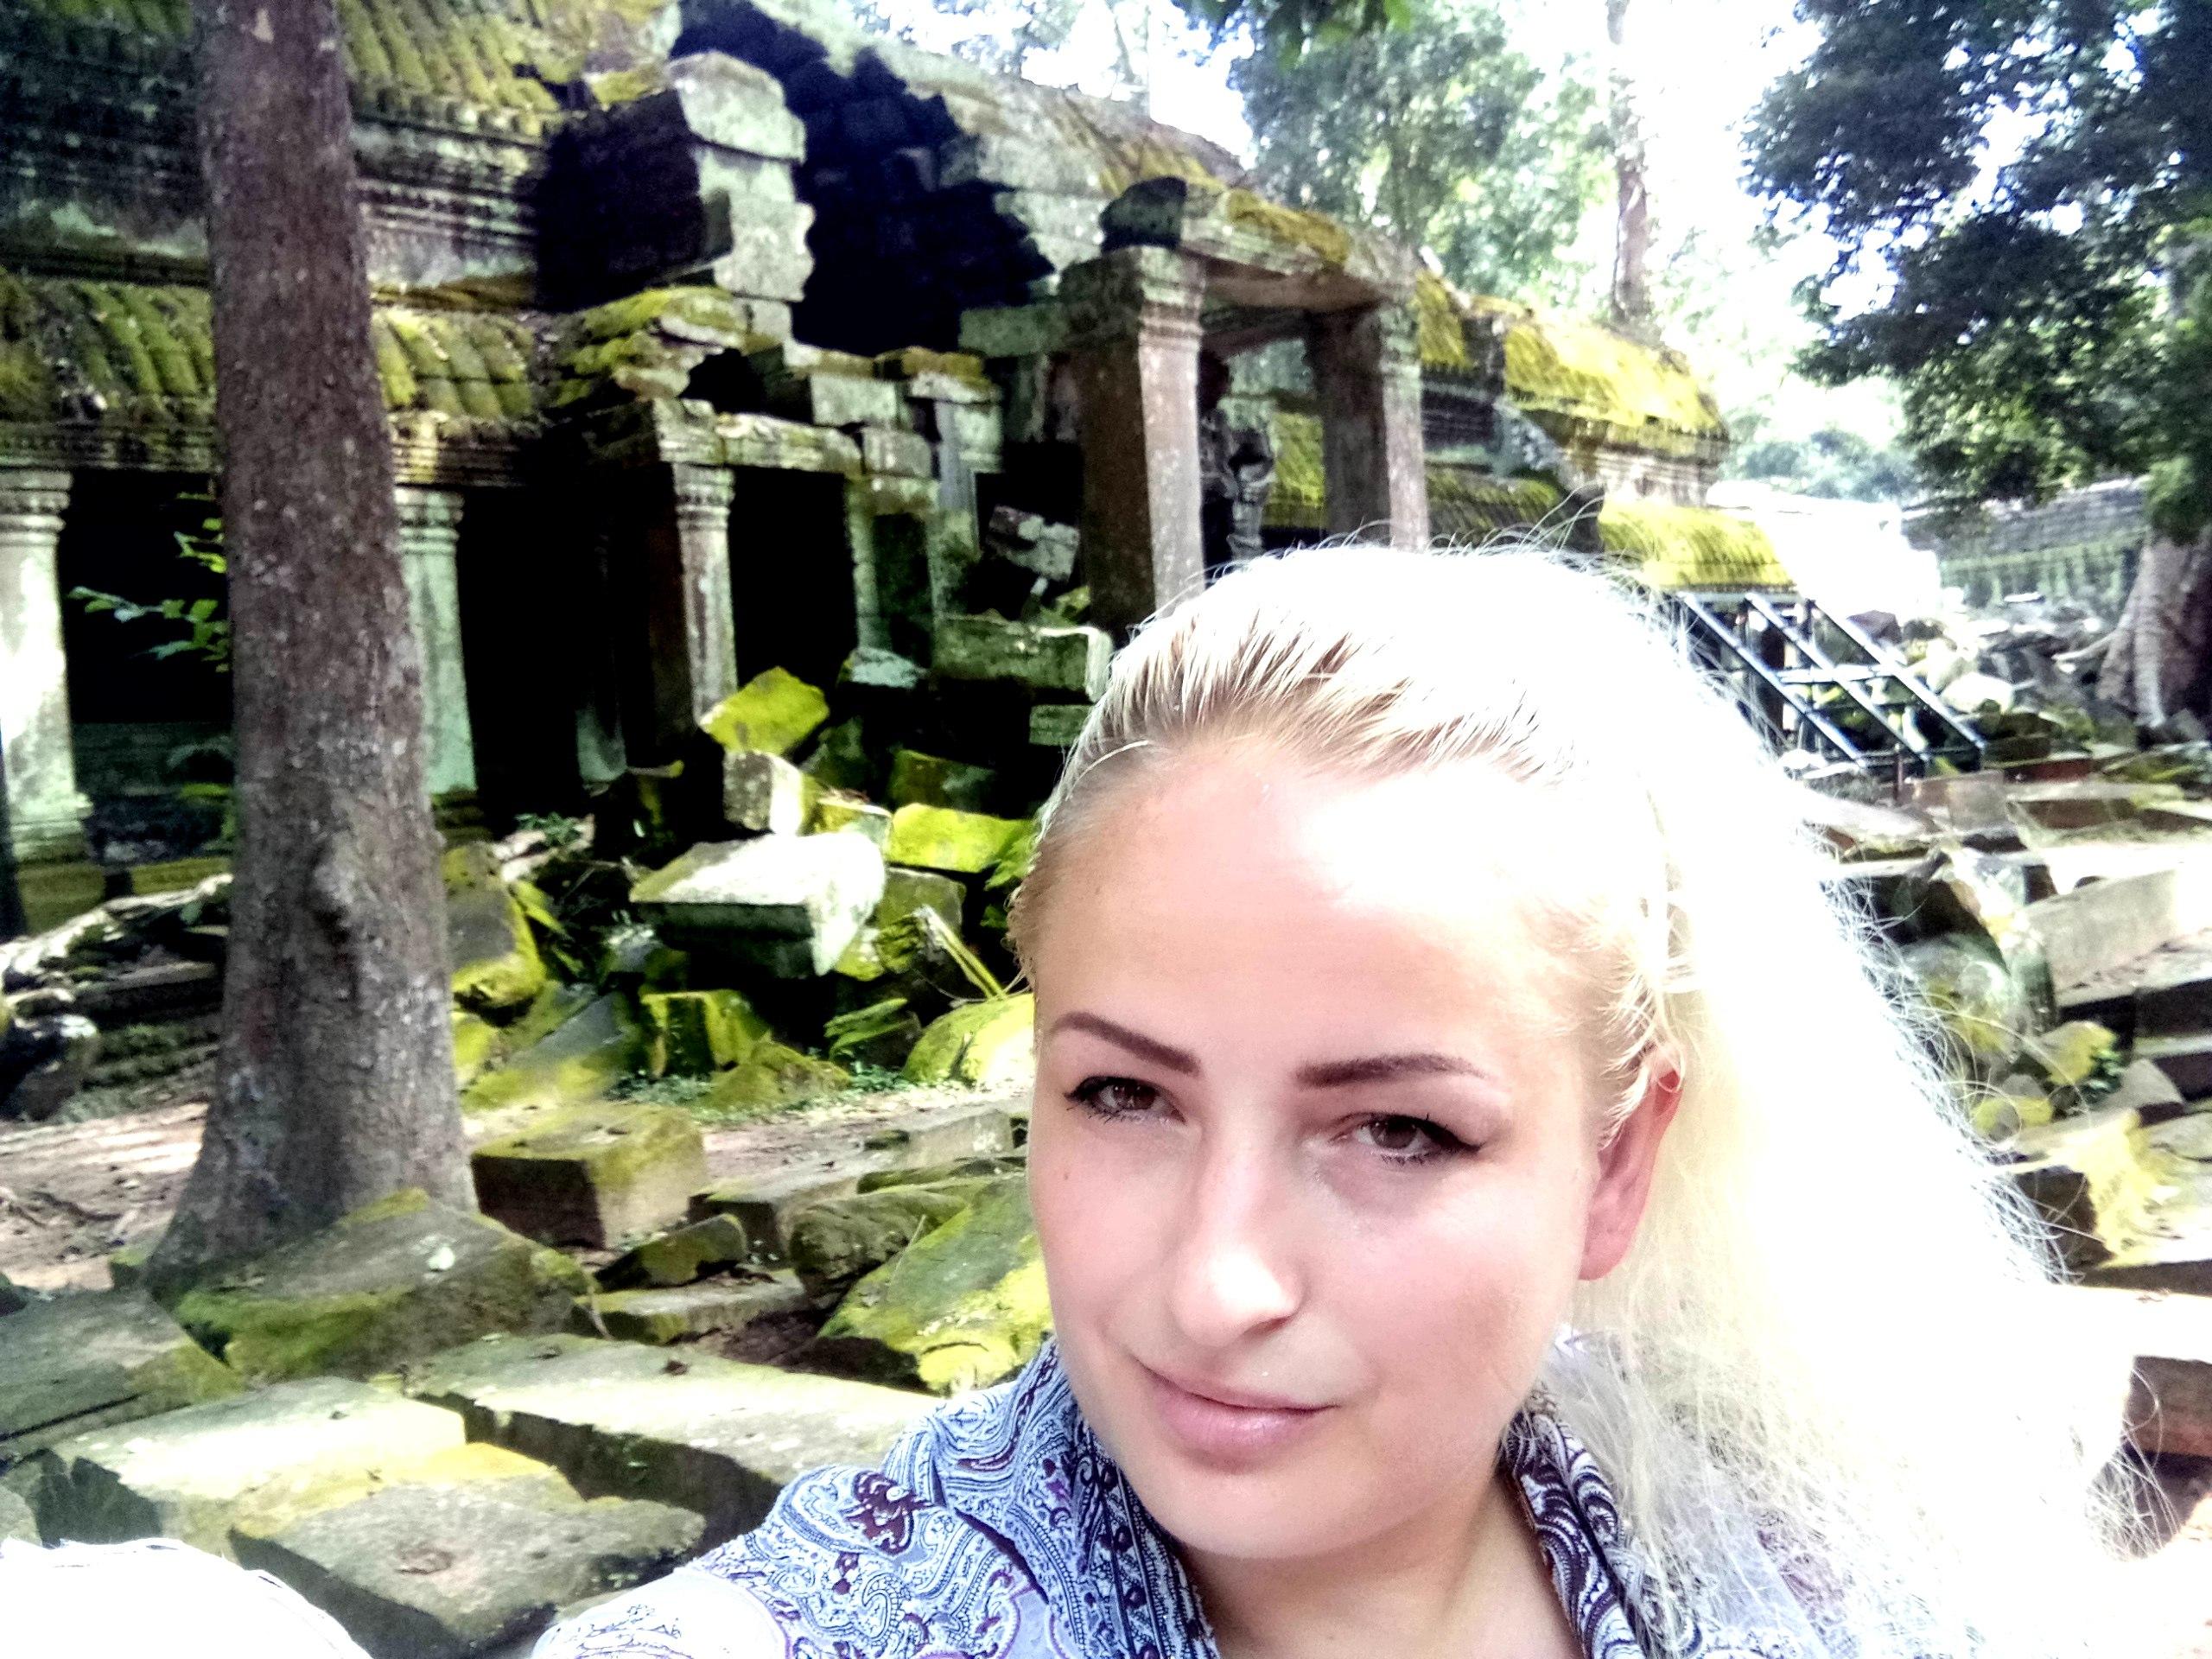 Елена Руденко (Валтея). Камбоджа. Ангкор. - Страница 3 YyVyoGtm2DQ